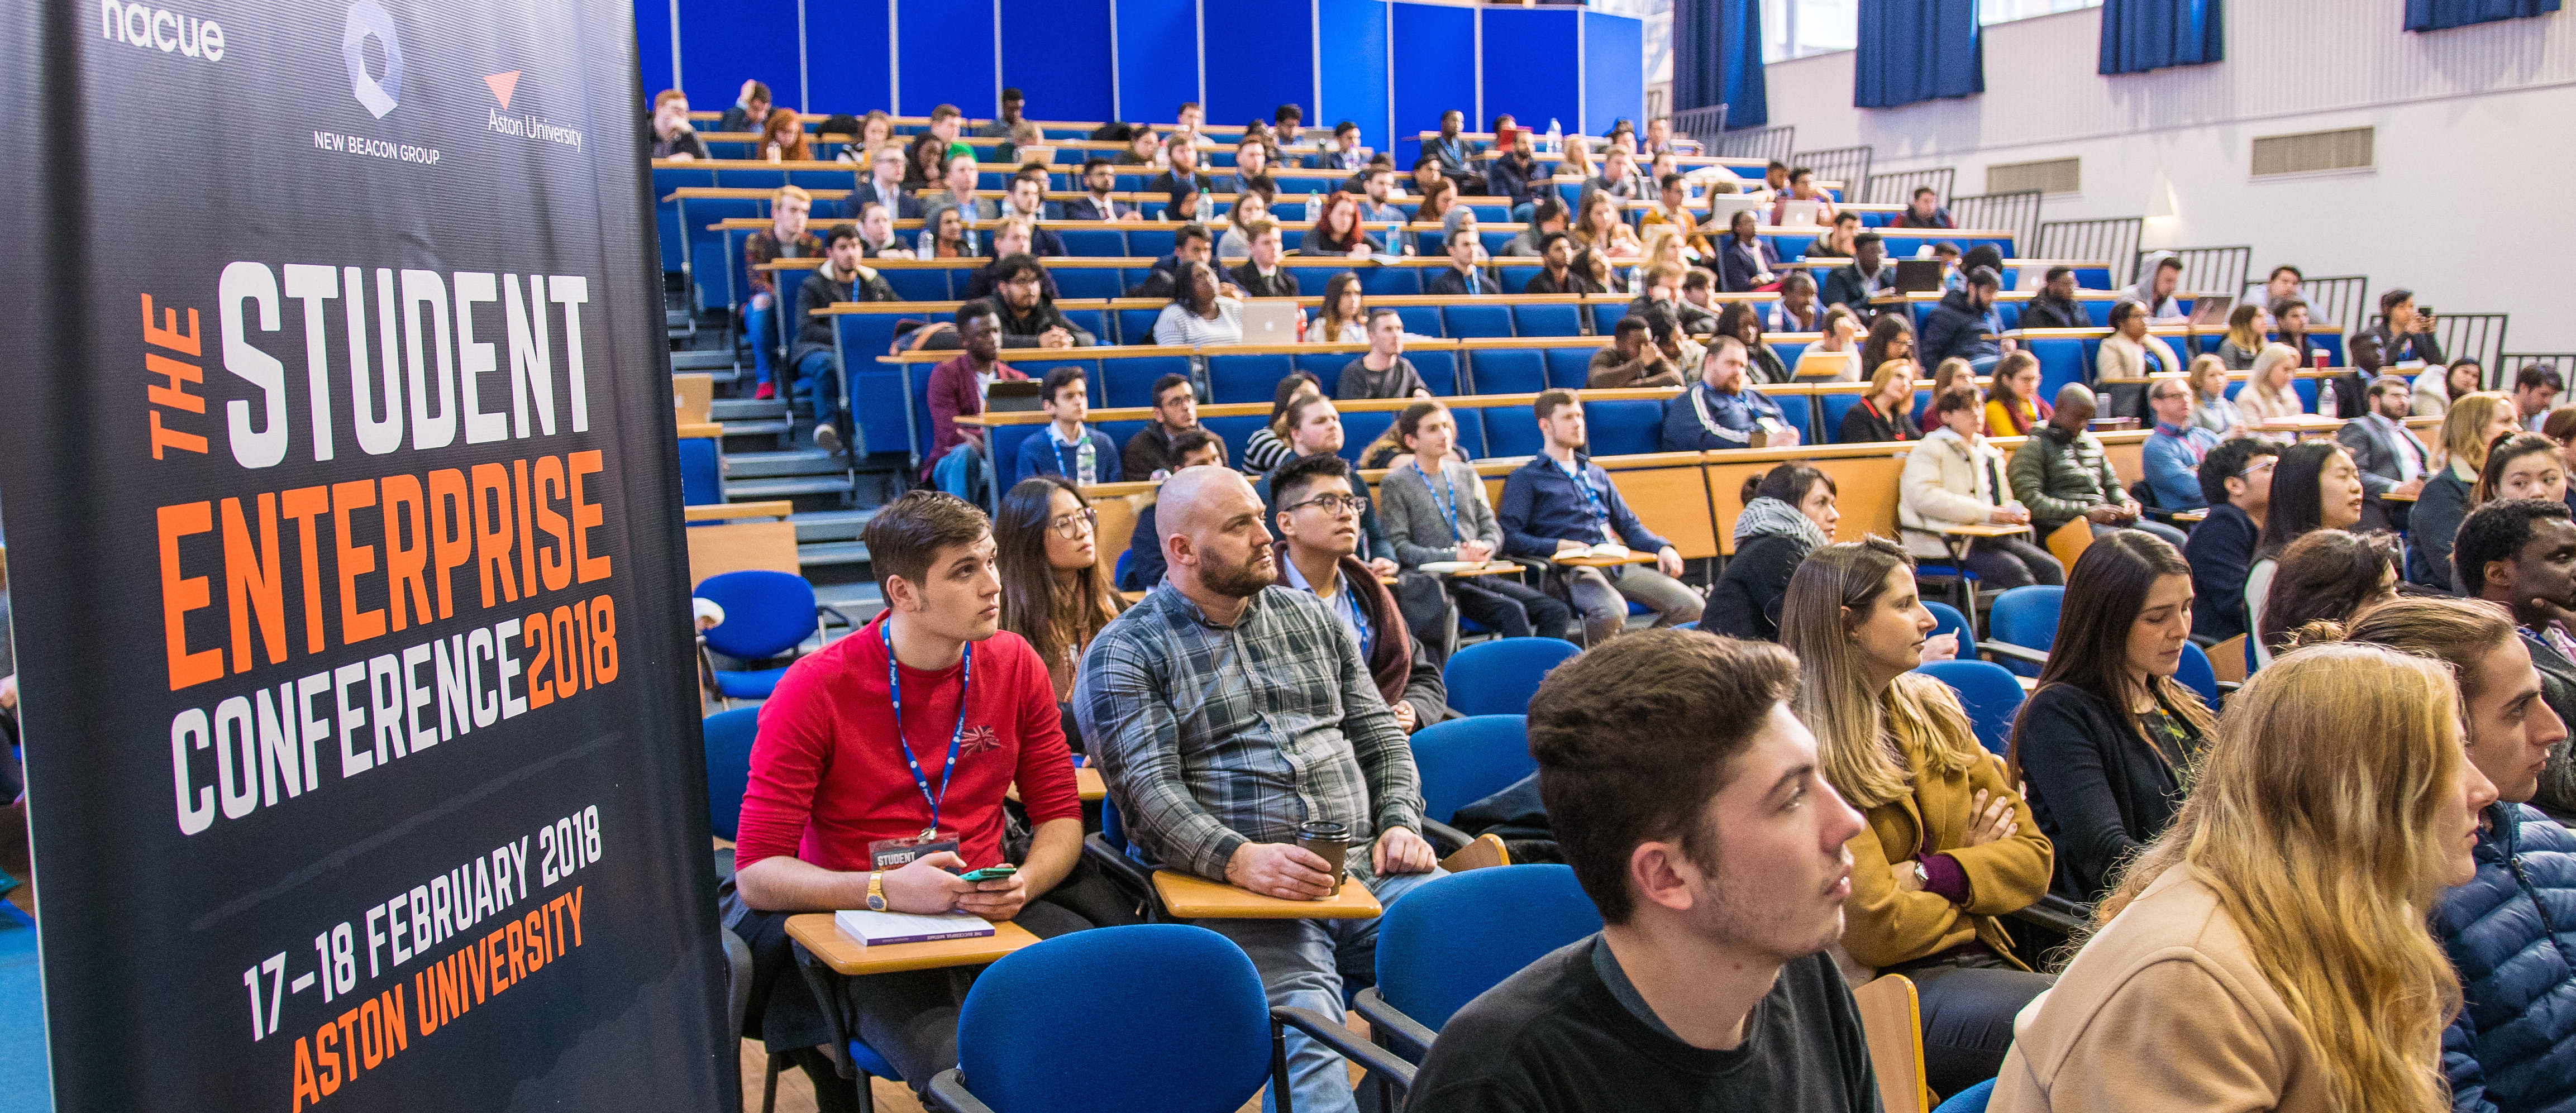 Student Enterprise Conference 2018